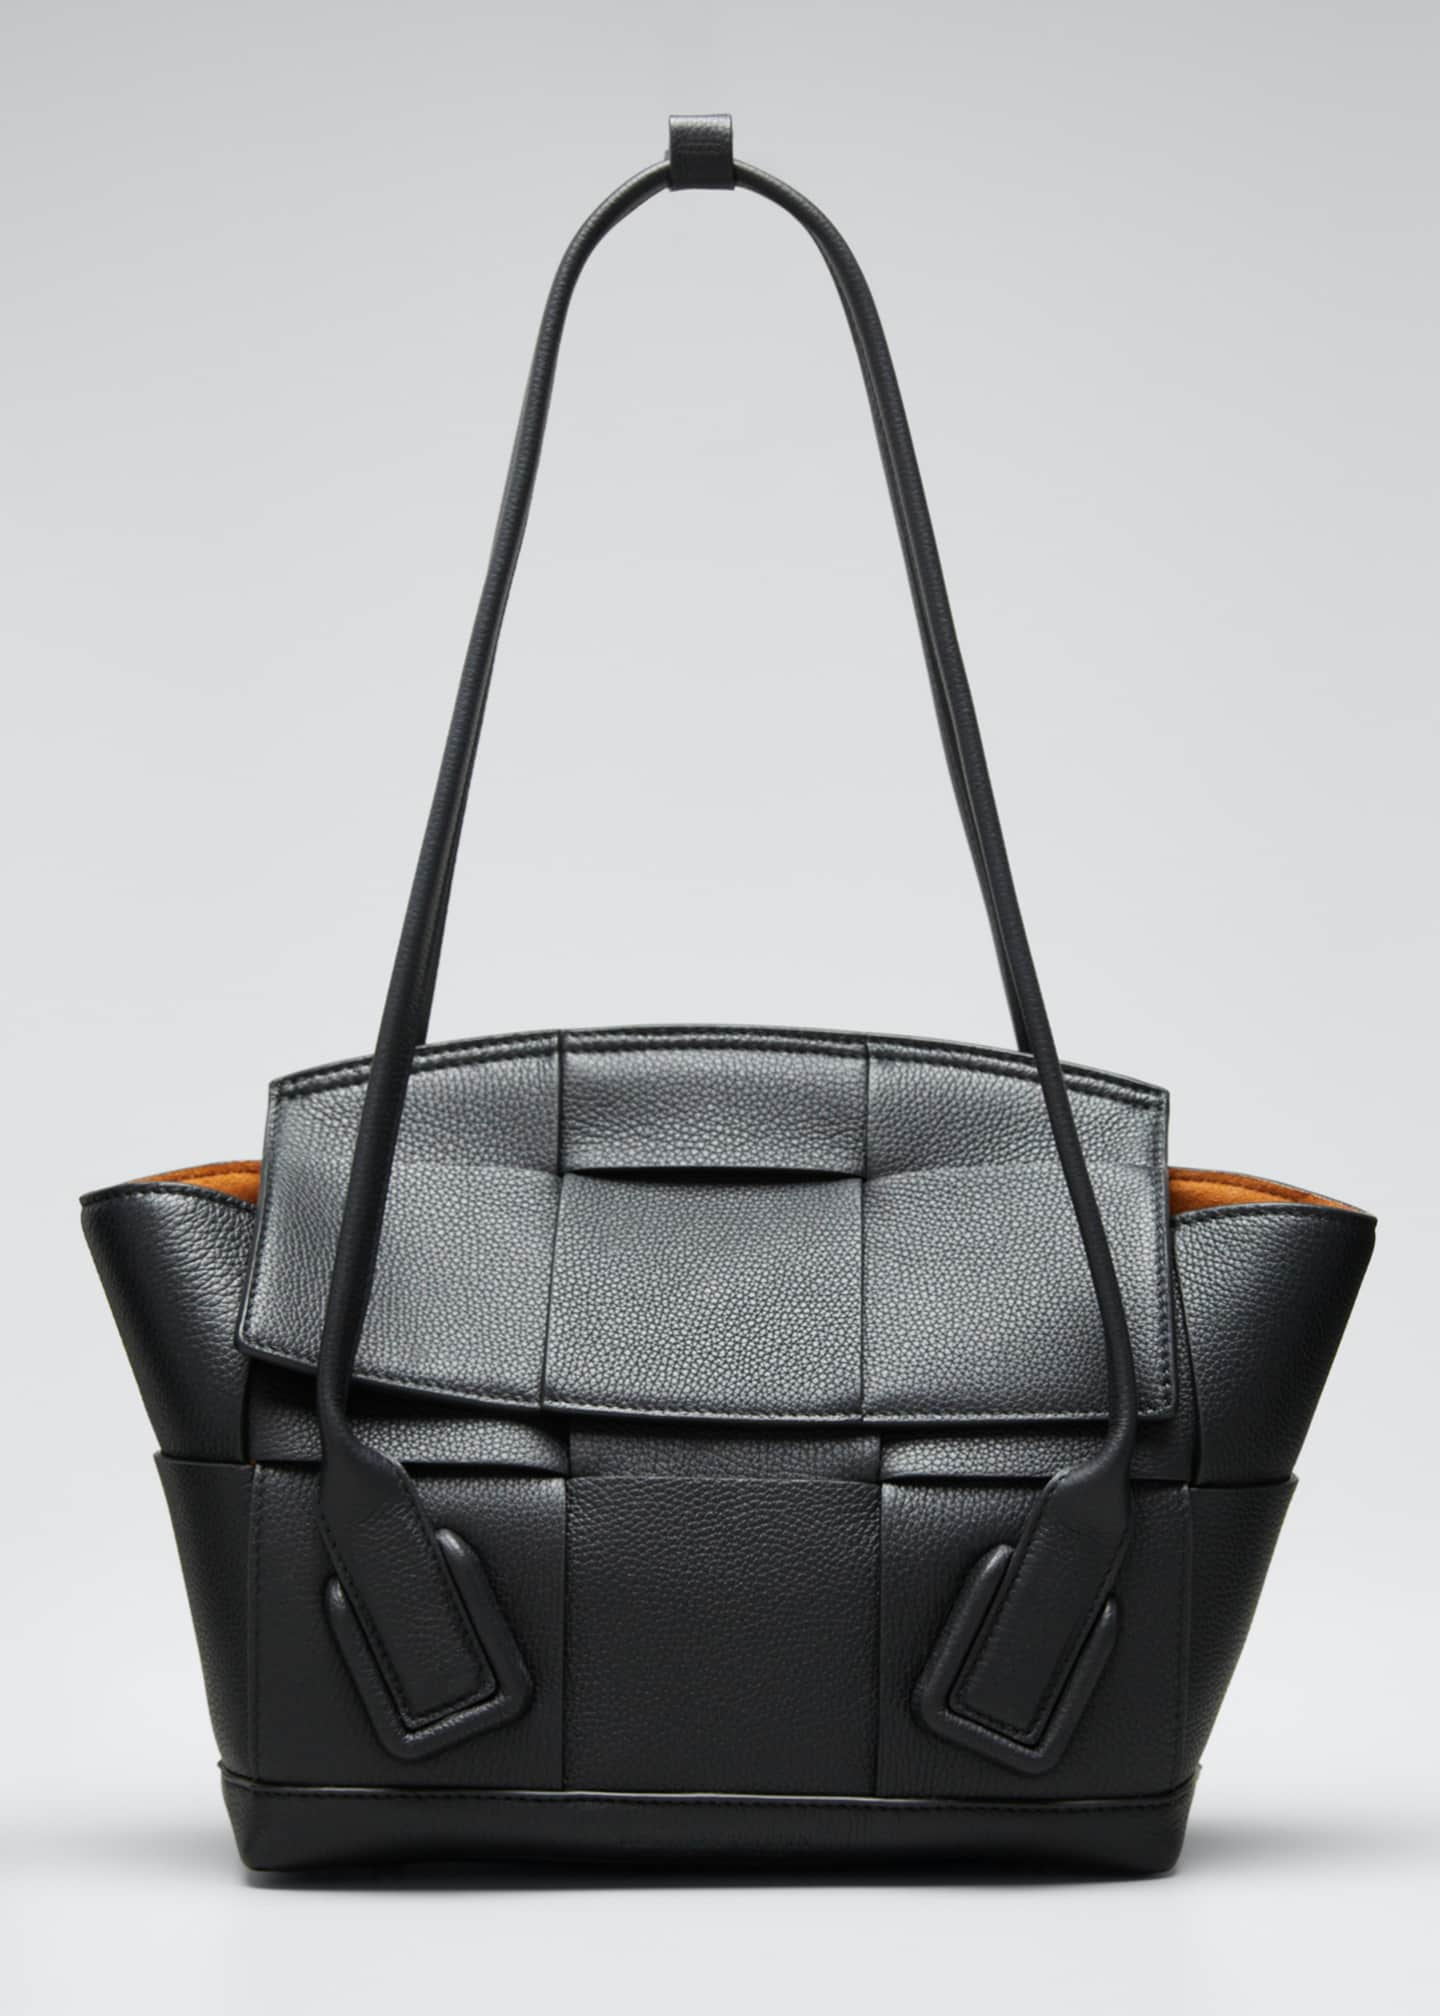 Bottega Veneta Arco Small Top-Handle Tote Bag